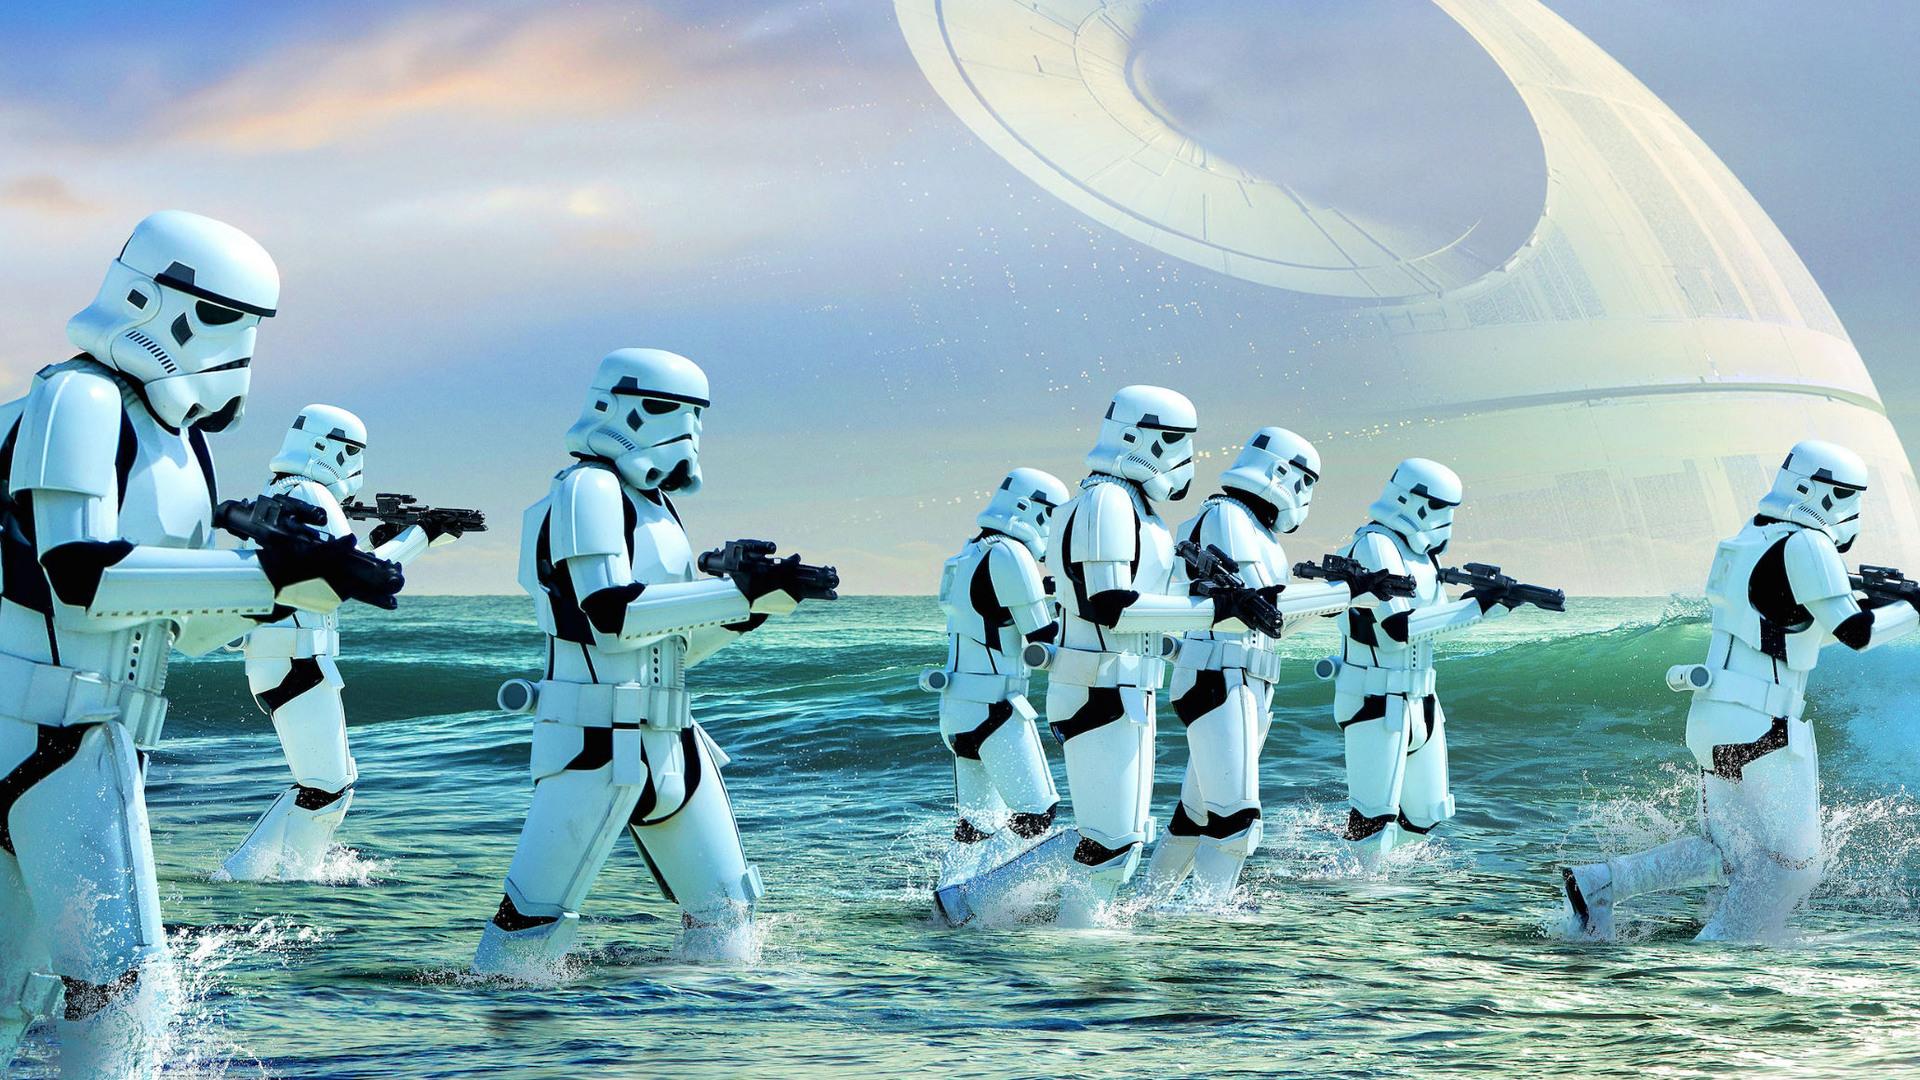 1920x1080 Stormtrooper Rogue One A Star Wars Laptop Full Hd 1080p Hd